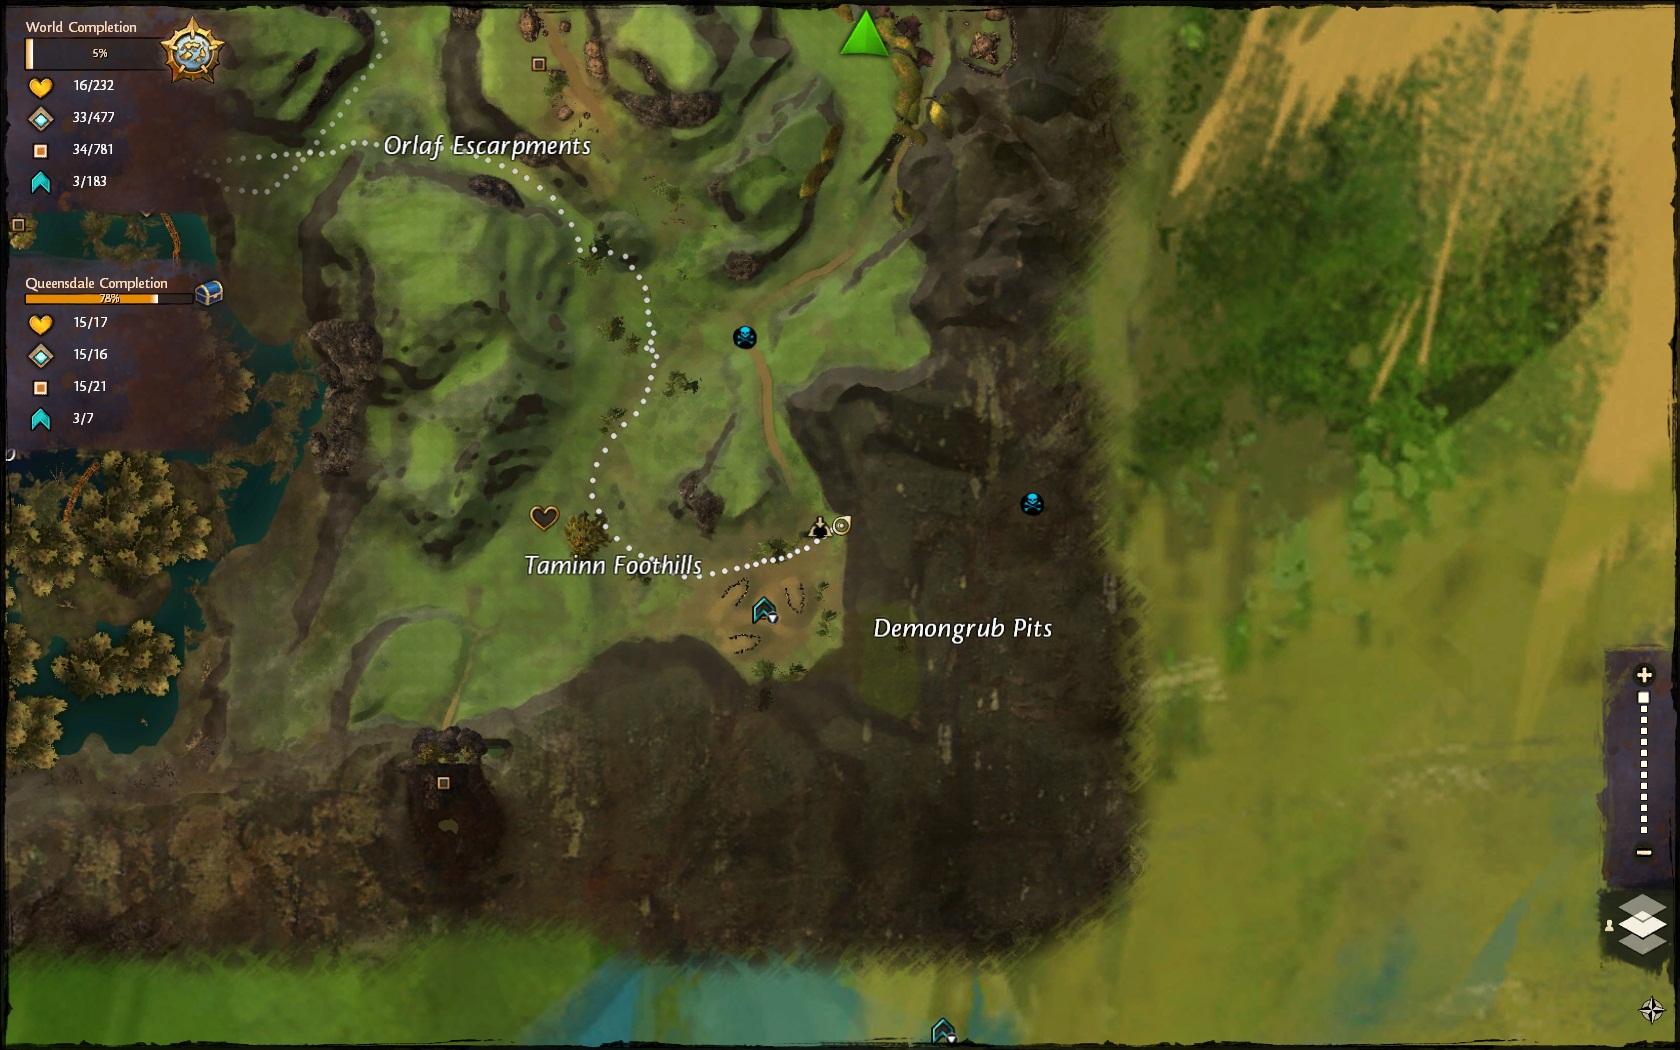 Demongrub Pits cave map